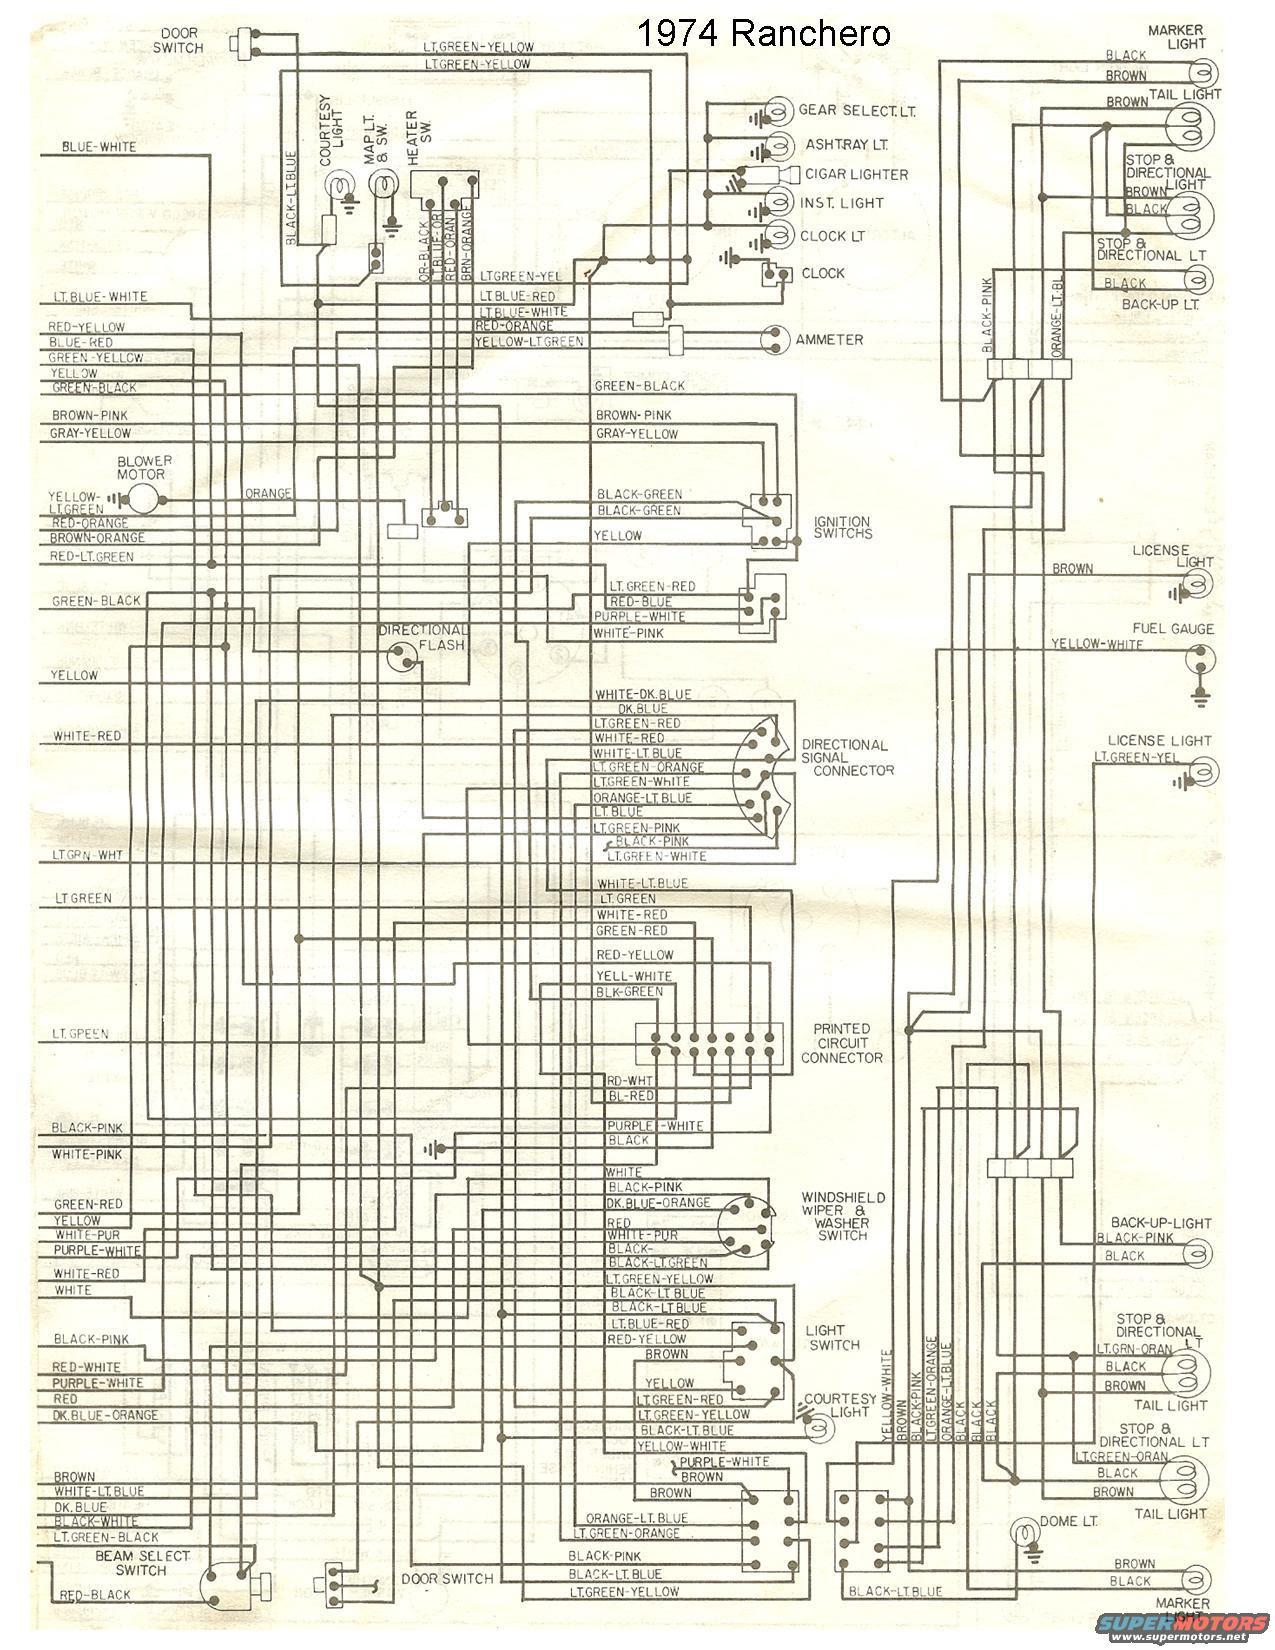 72 76 Wiring Diagrams Ranchero Us